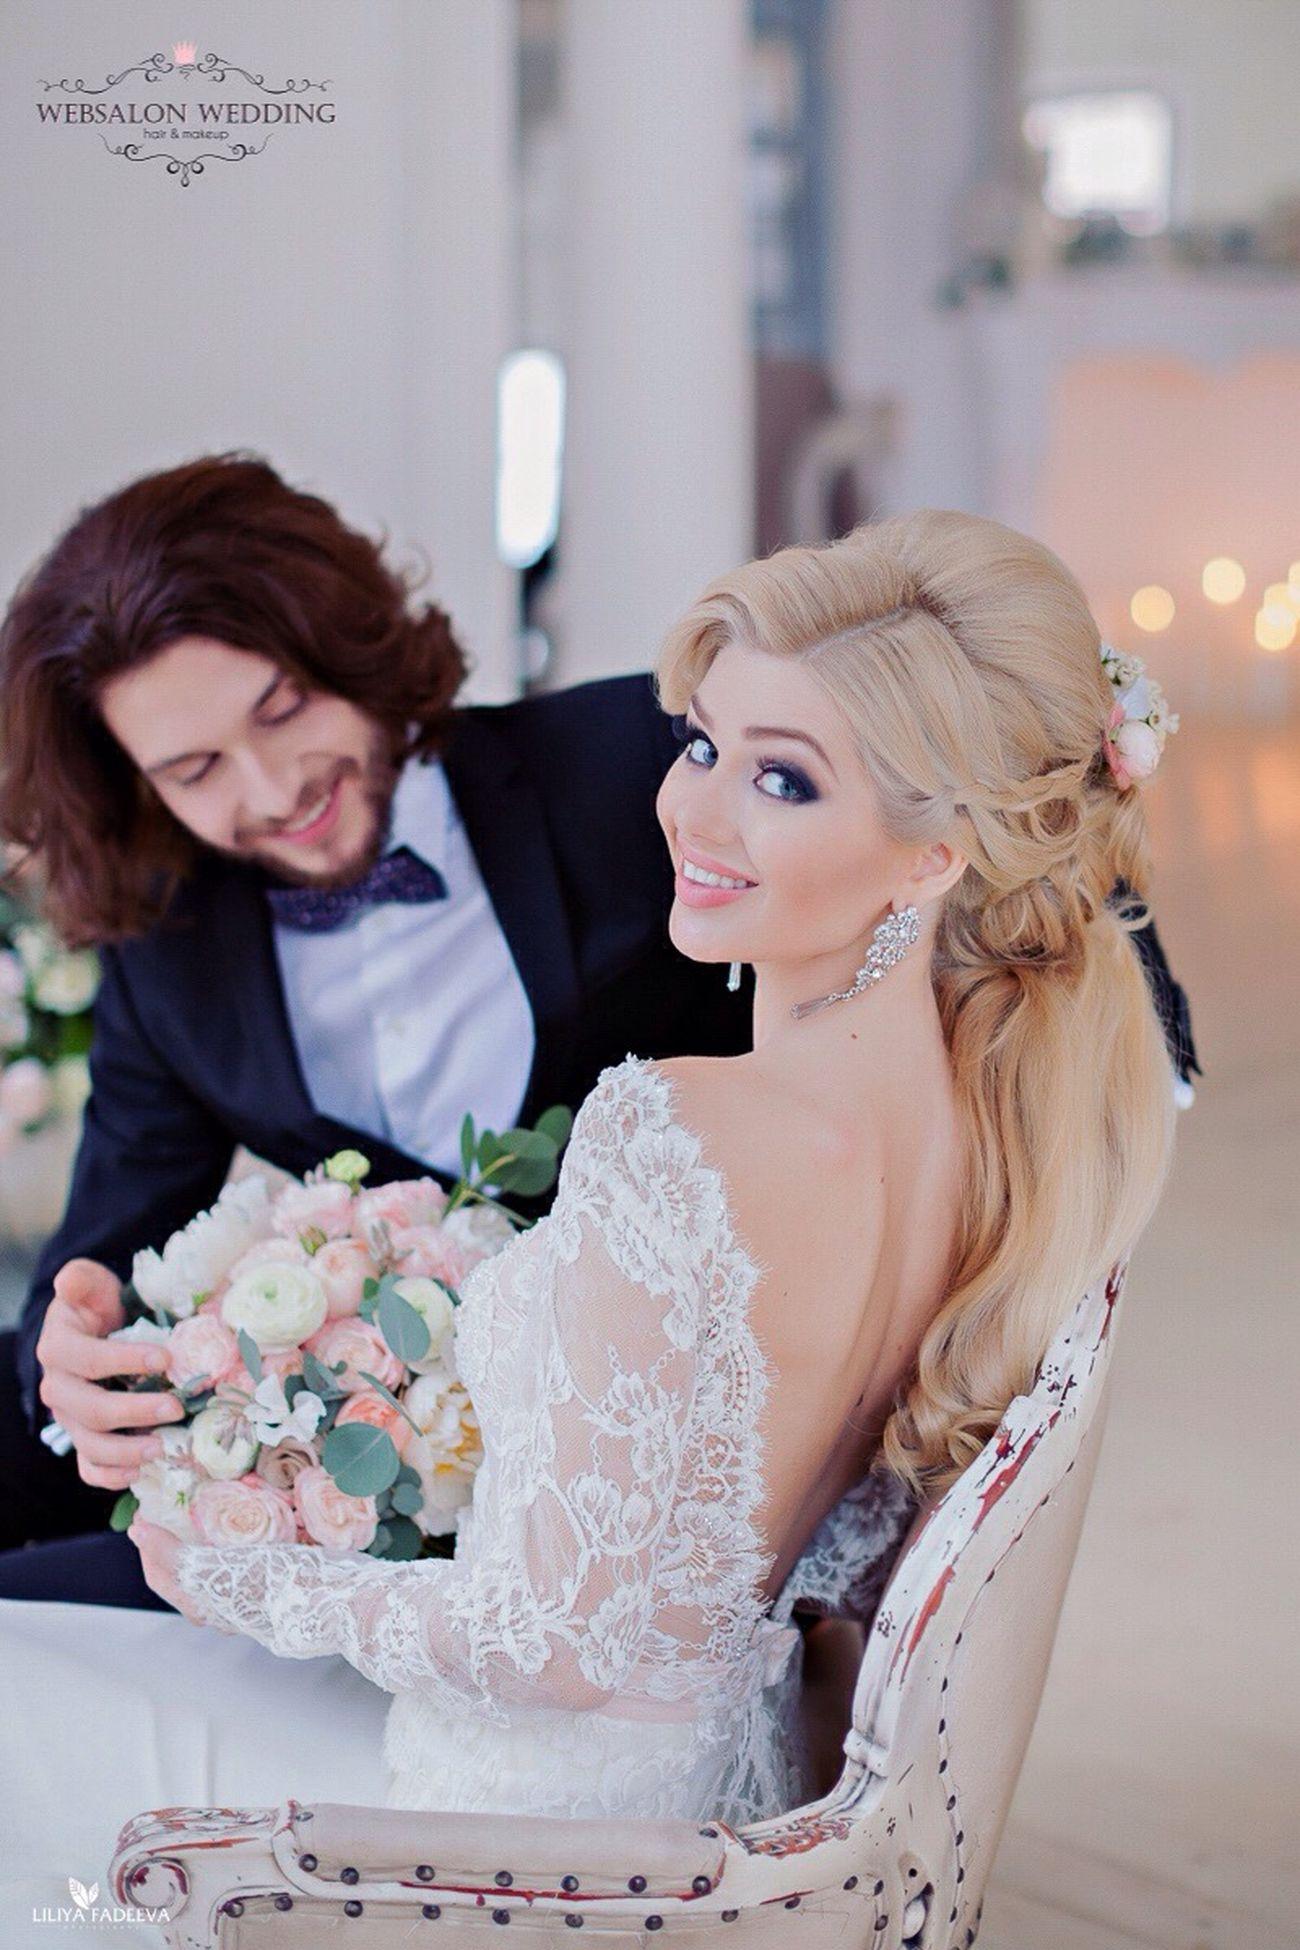 Wedding Dress Novia2015 Happy Wedding Wedding2015 Wedding Photography Blonde Girl Blondie Hairdresser Pretty♡ Redlips